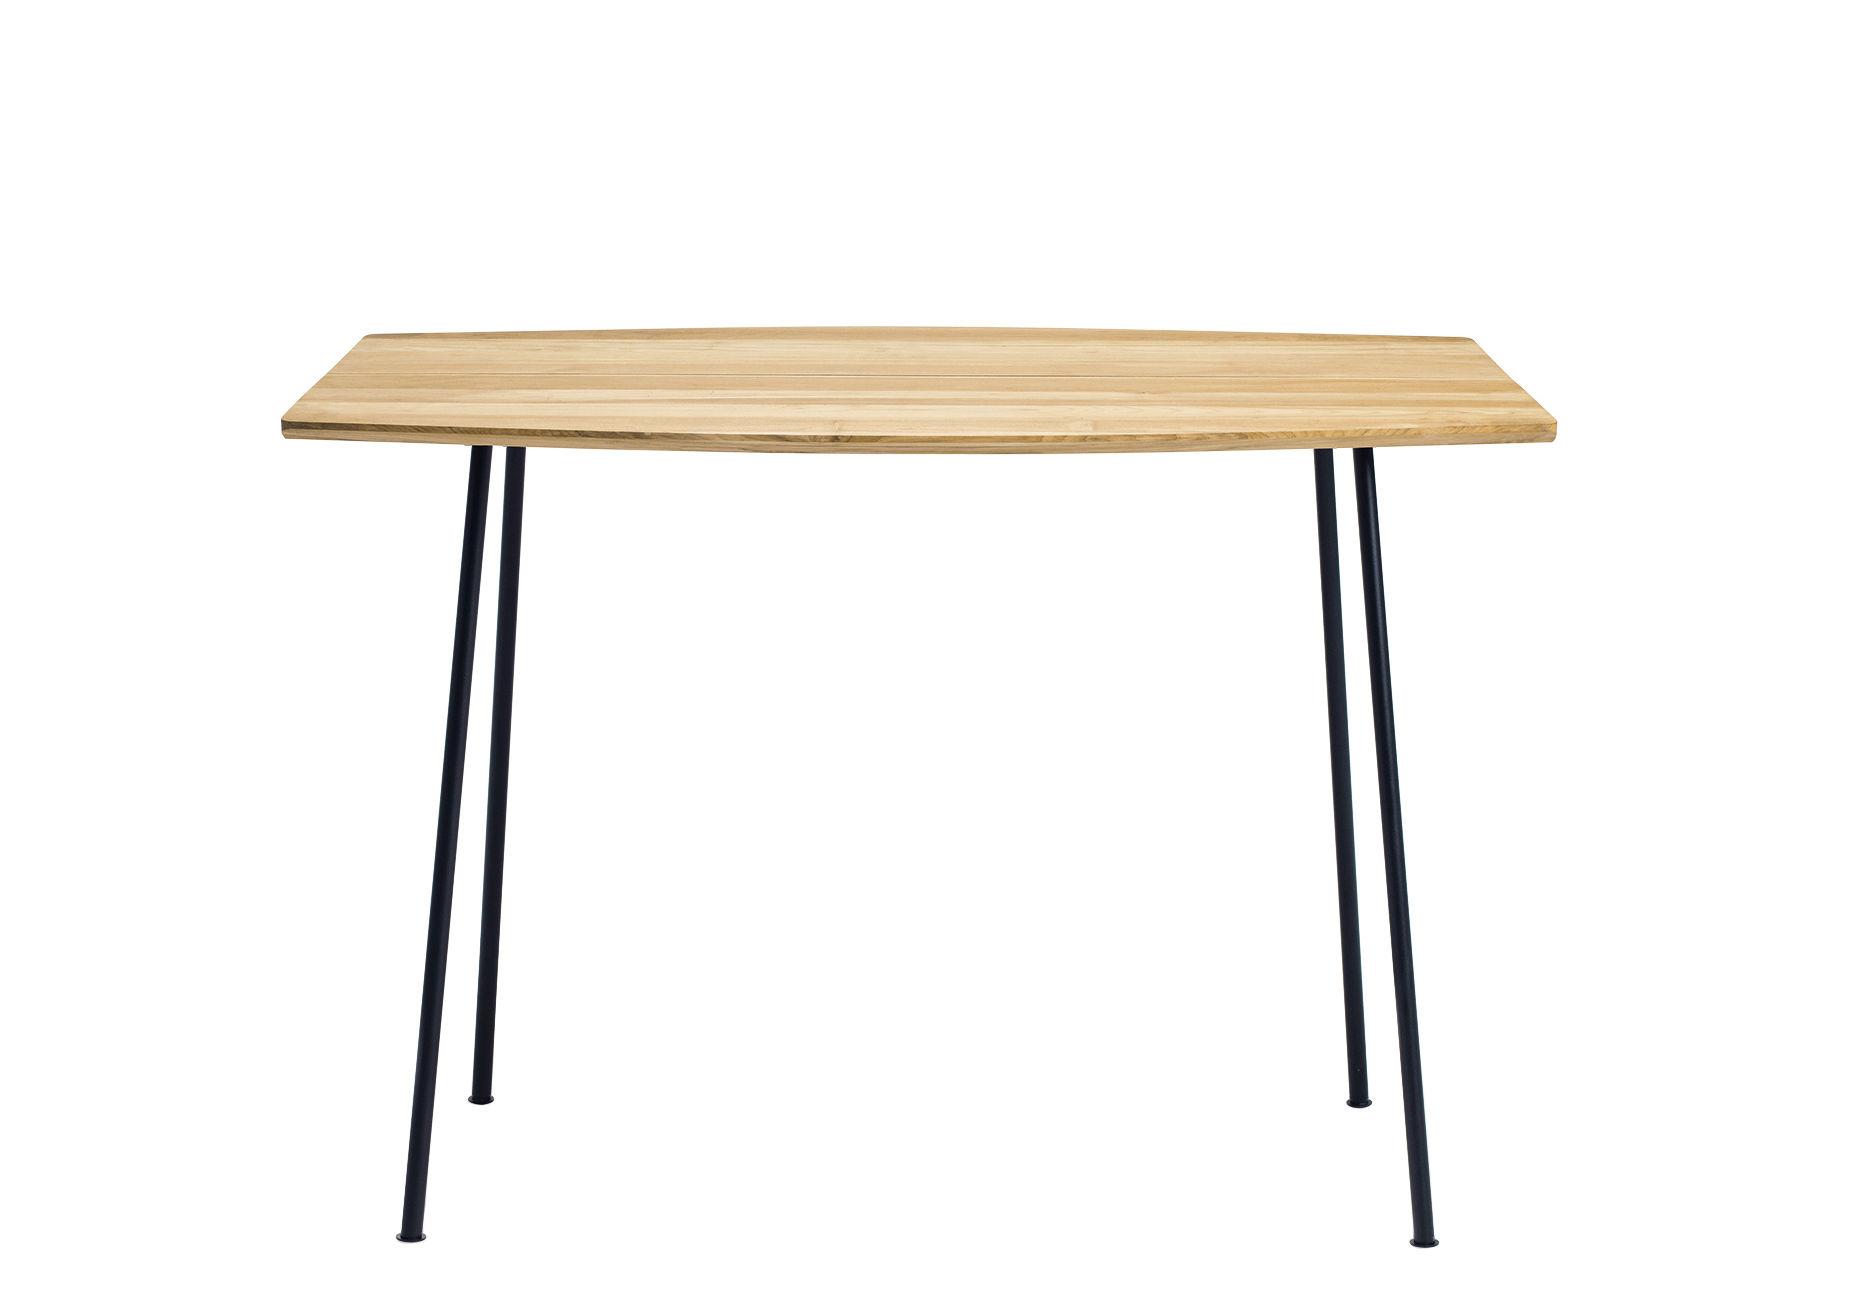 Outdoor - Tische - Agave quadratischer Tisch / 90 x 90 cm - Ethimo - Teakholz & schwarz - lackiertes Metall, Teck naturel